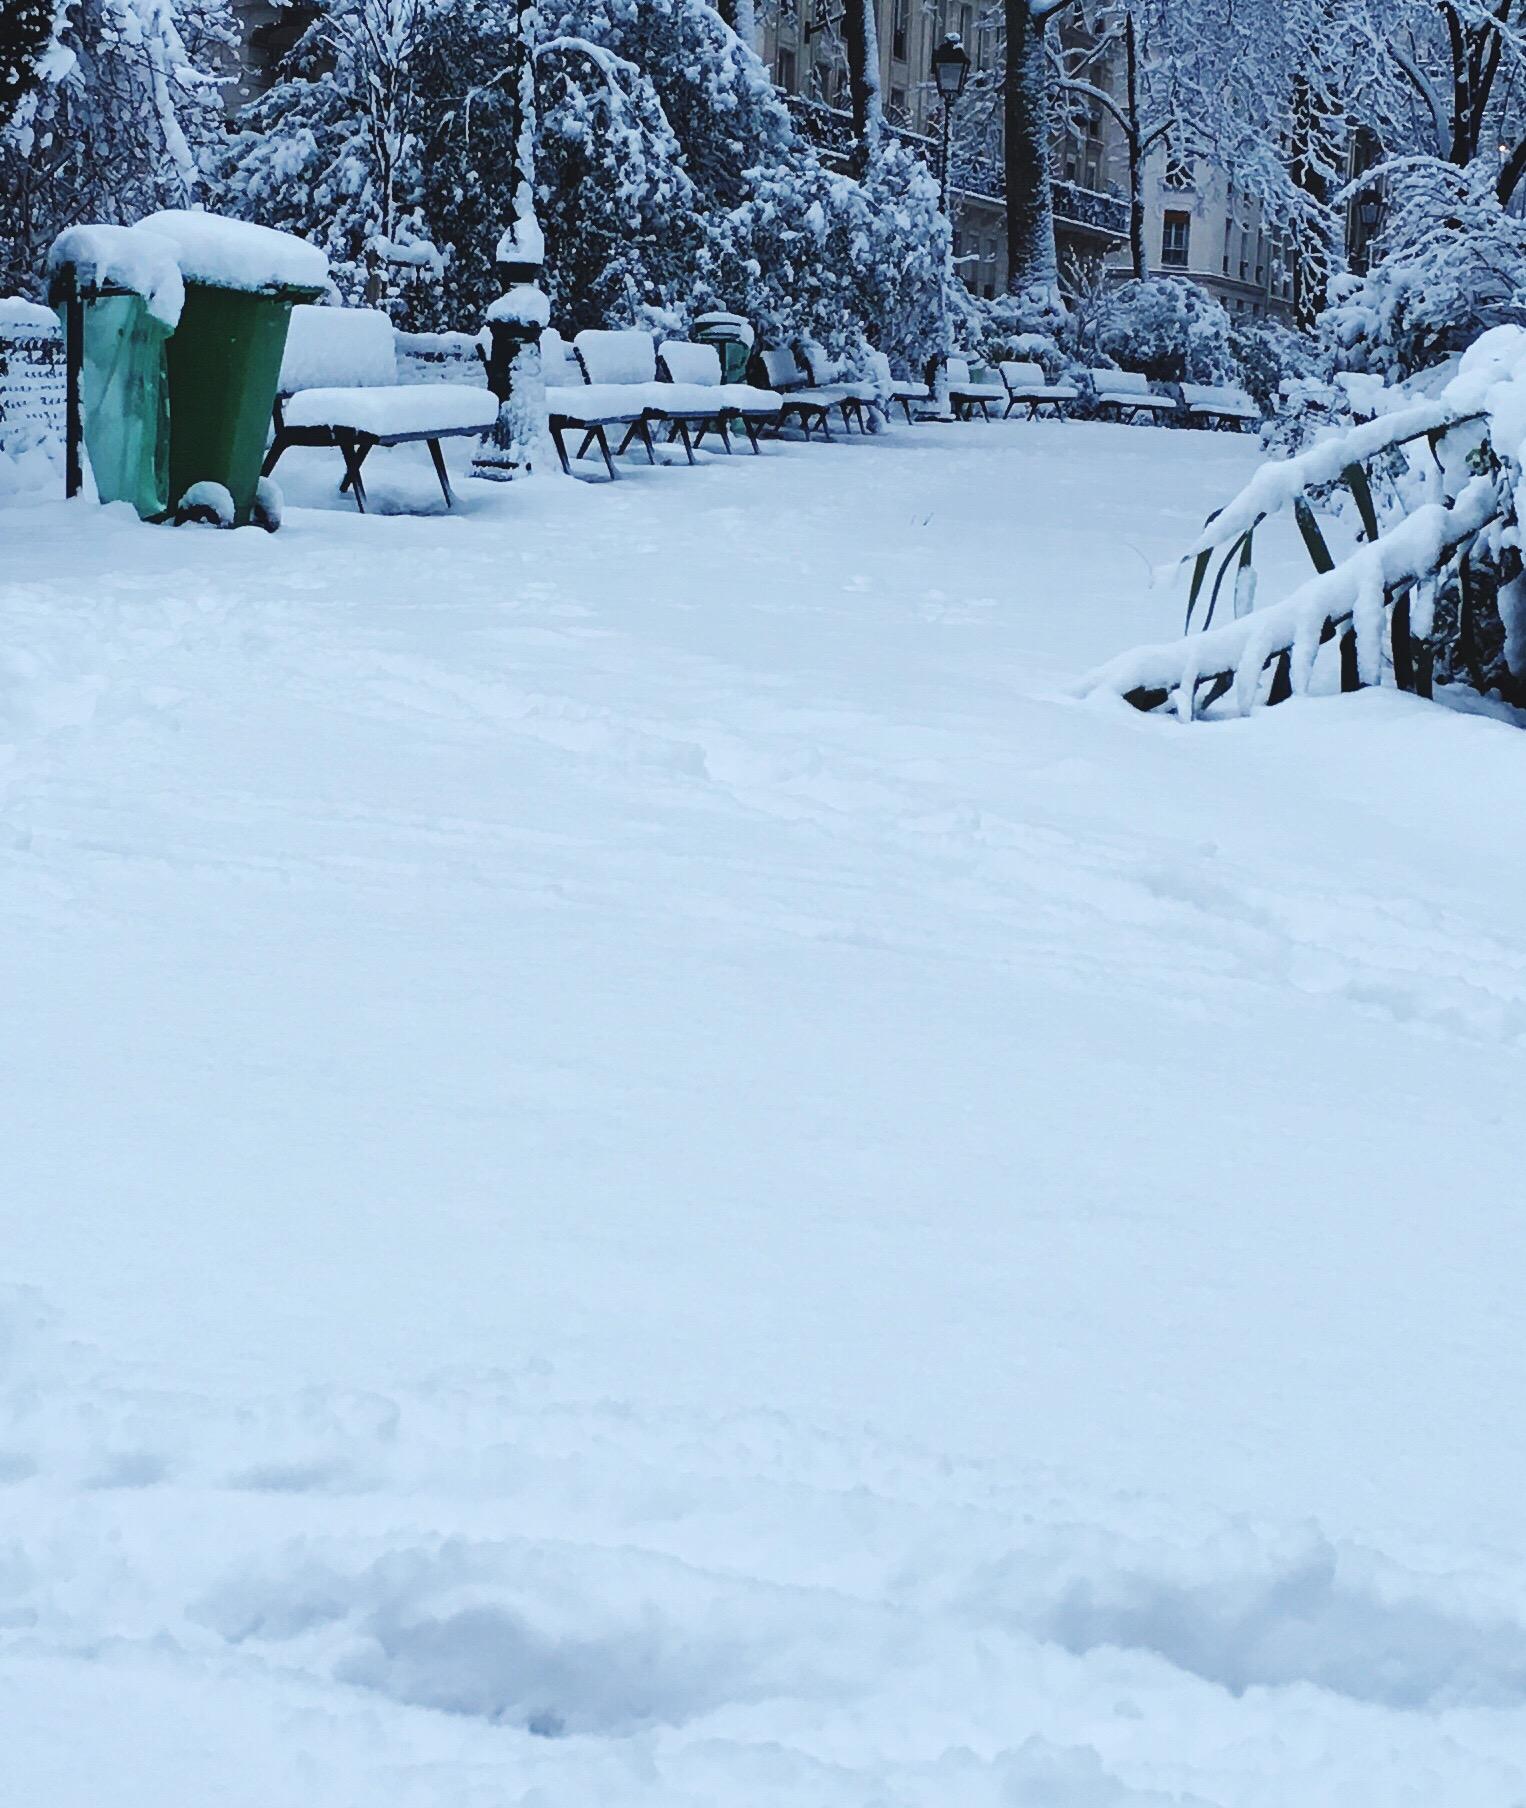 Snow-covered Square Gardette